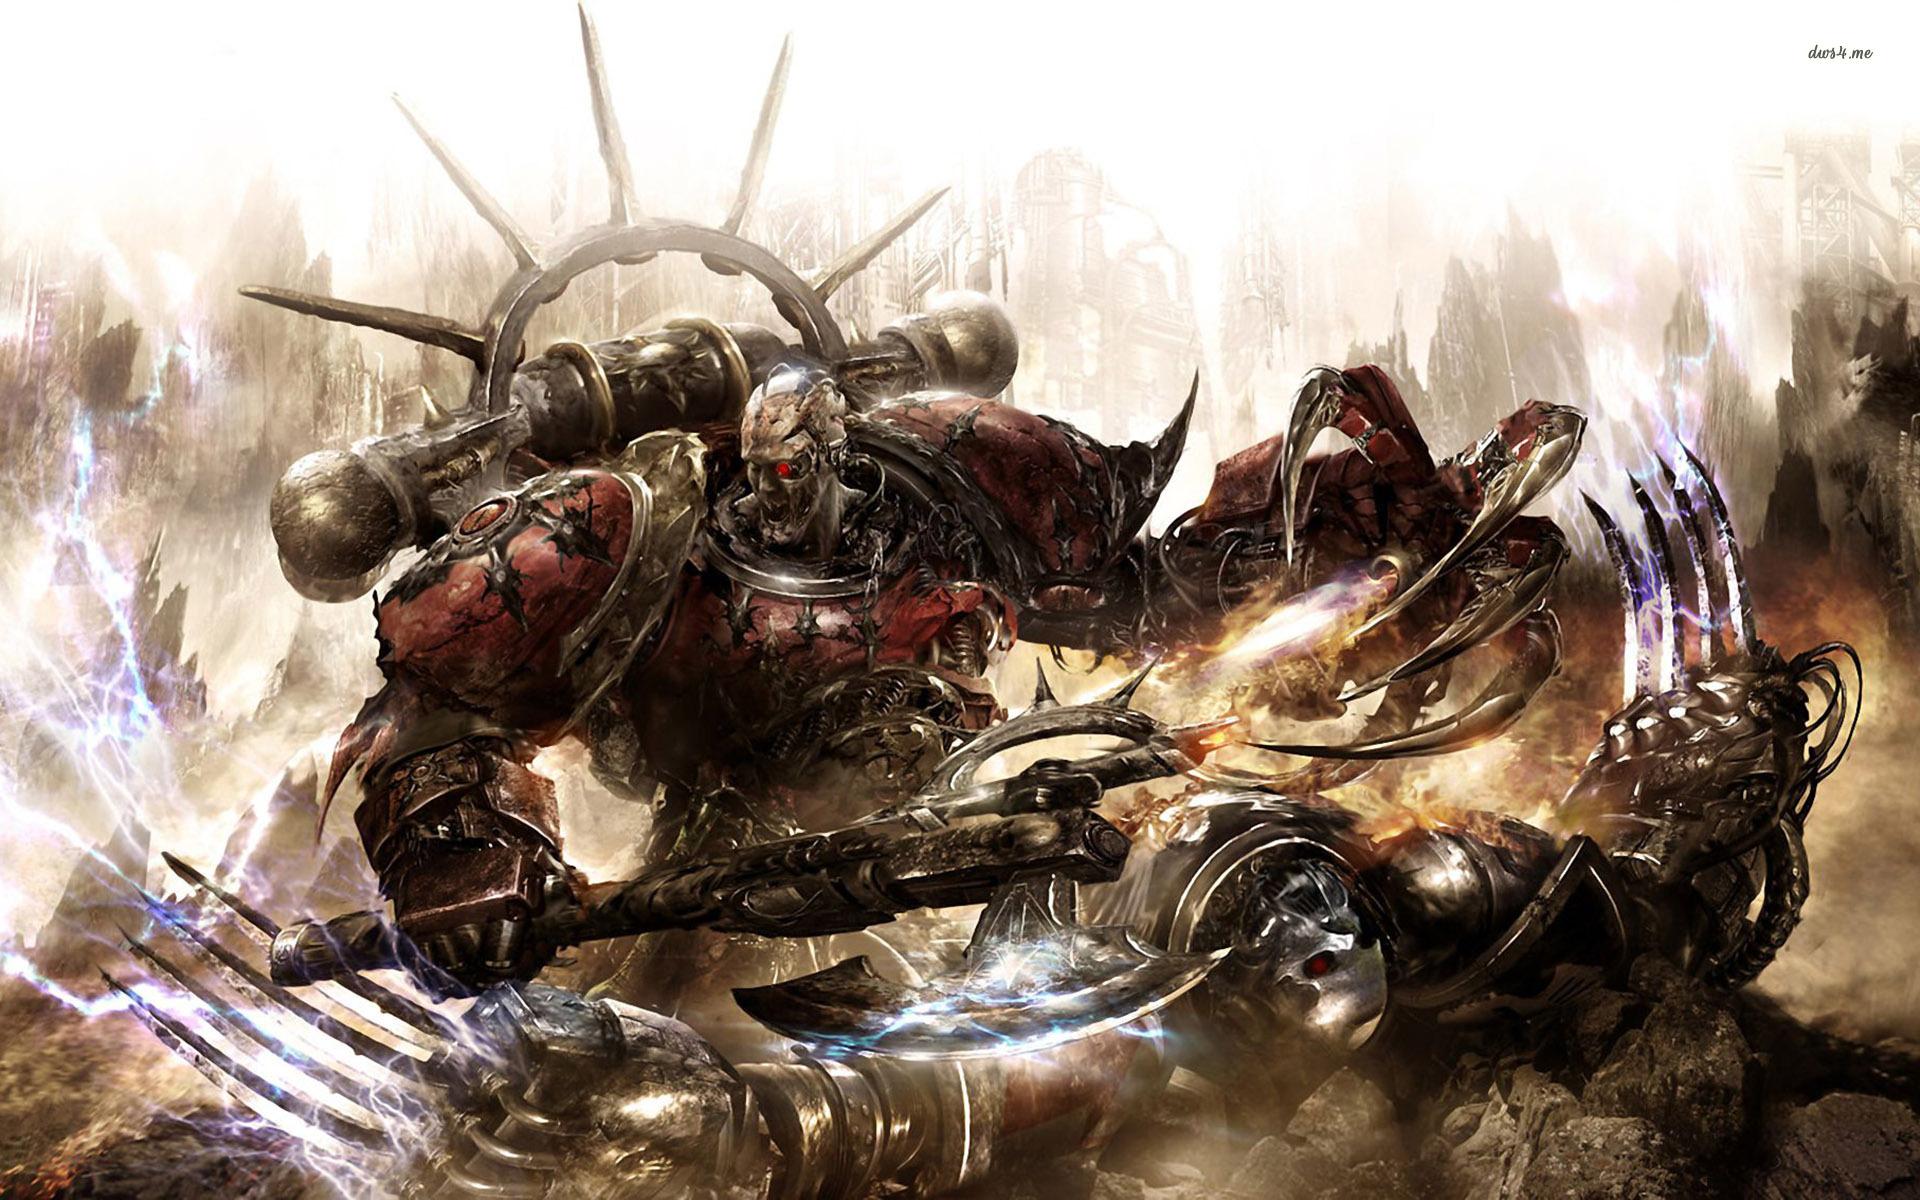 Warhammer clipart 1080p Backgrounds Warhammer Wallpapers Warhammer 40K